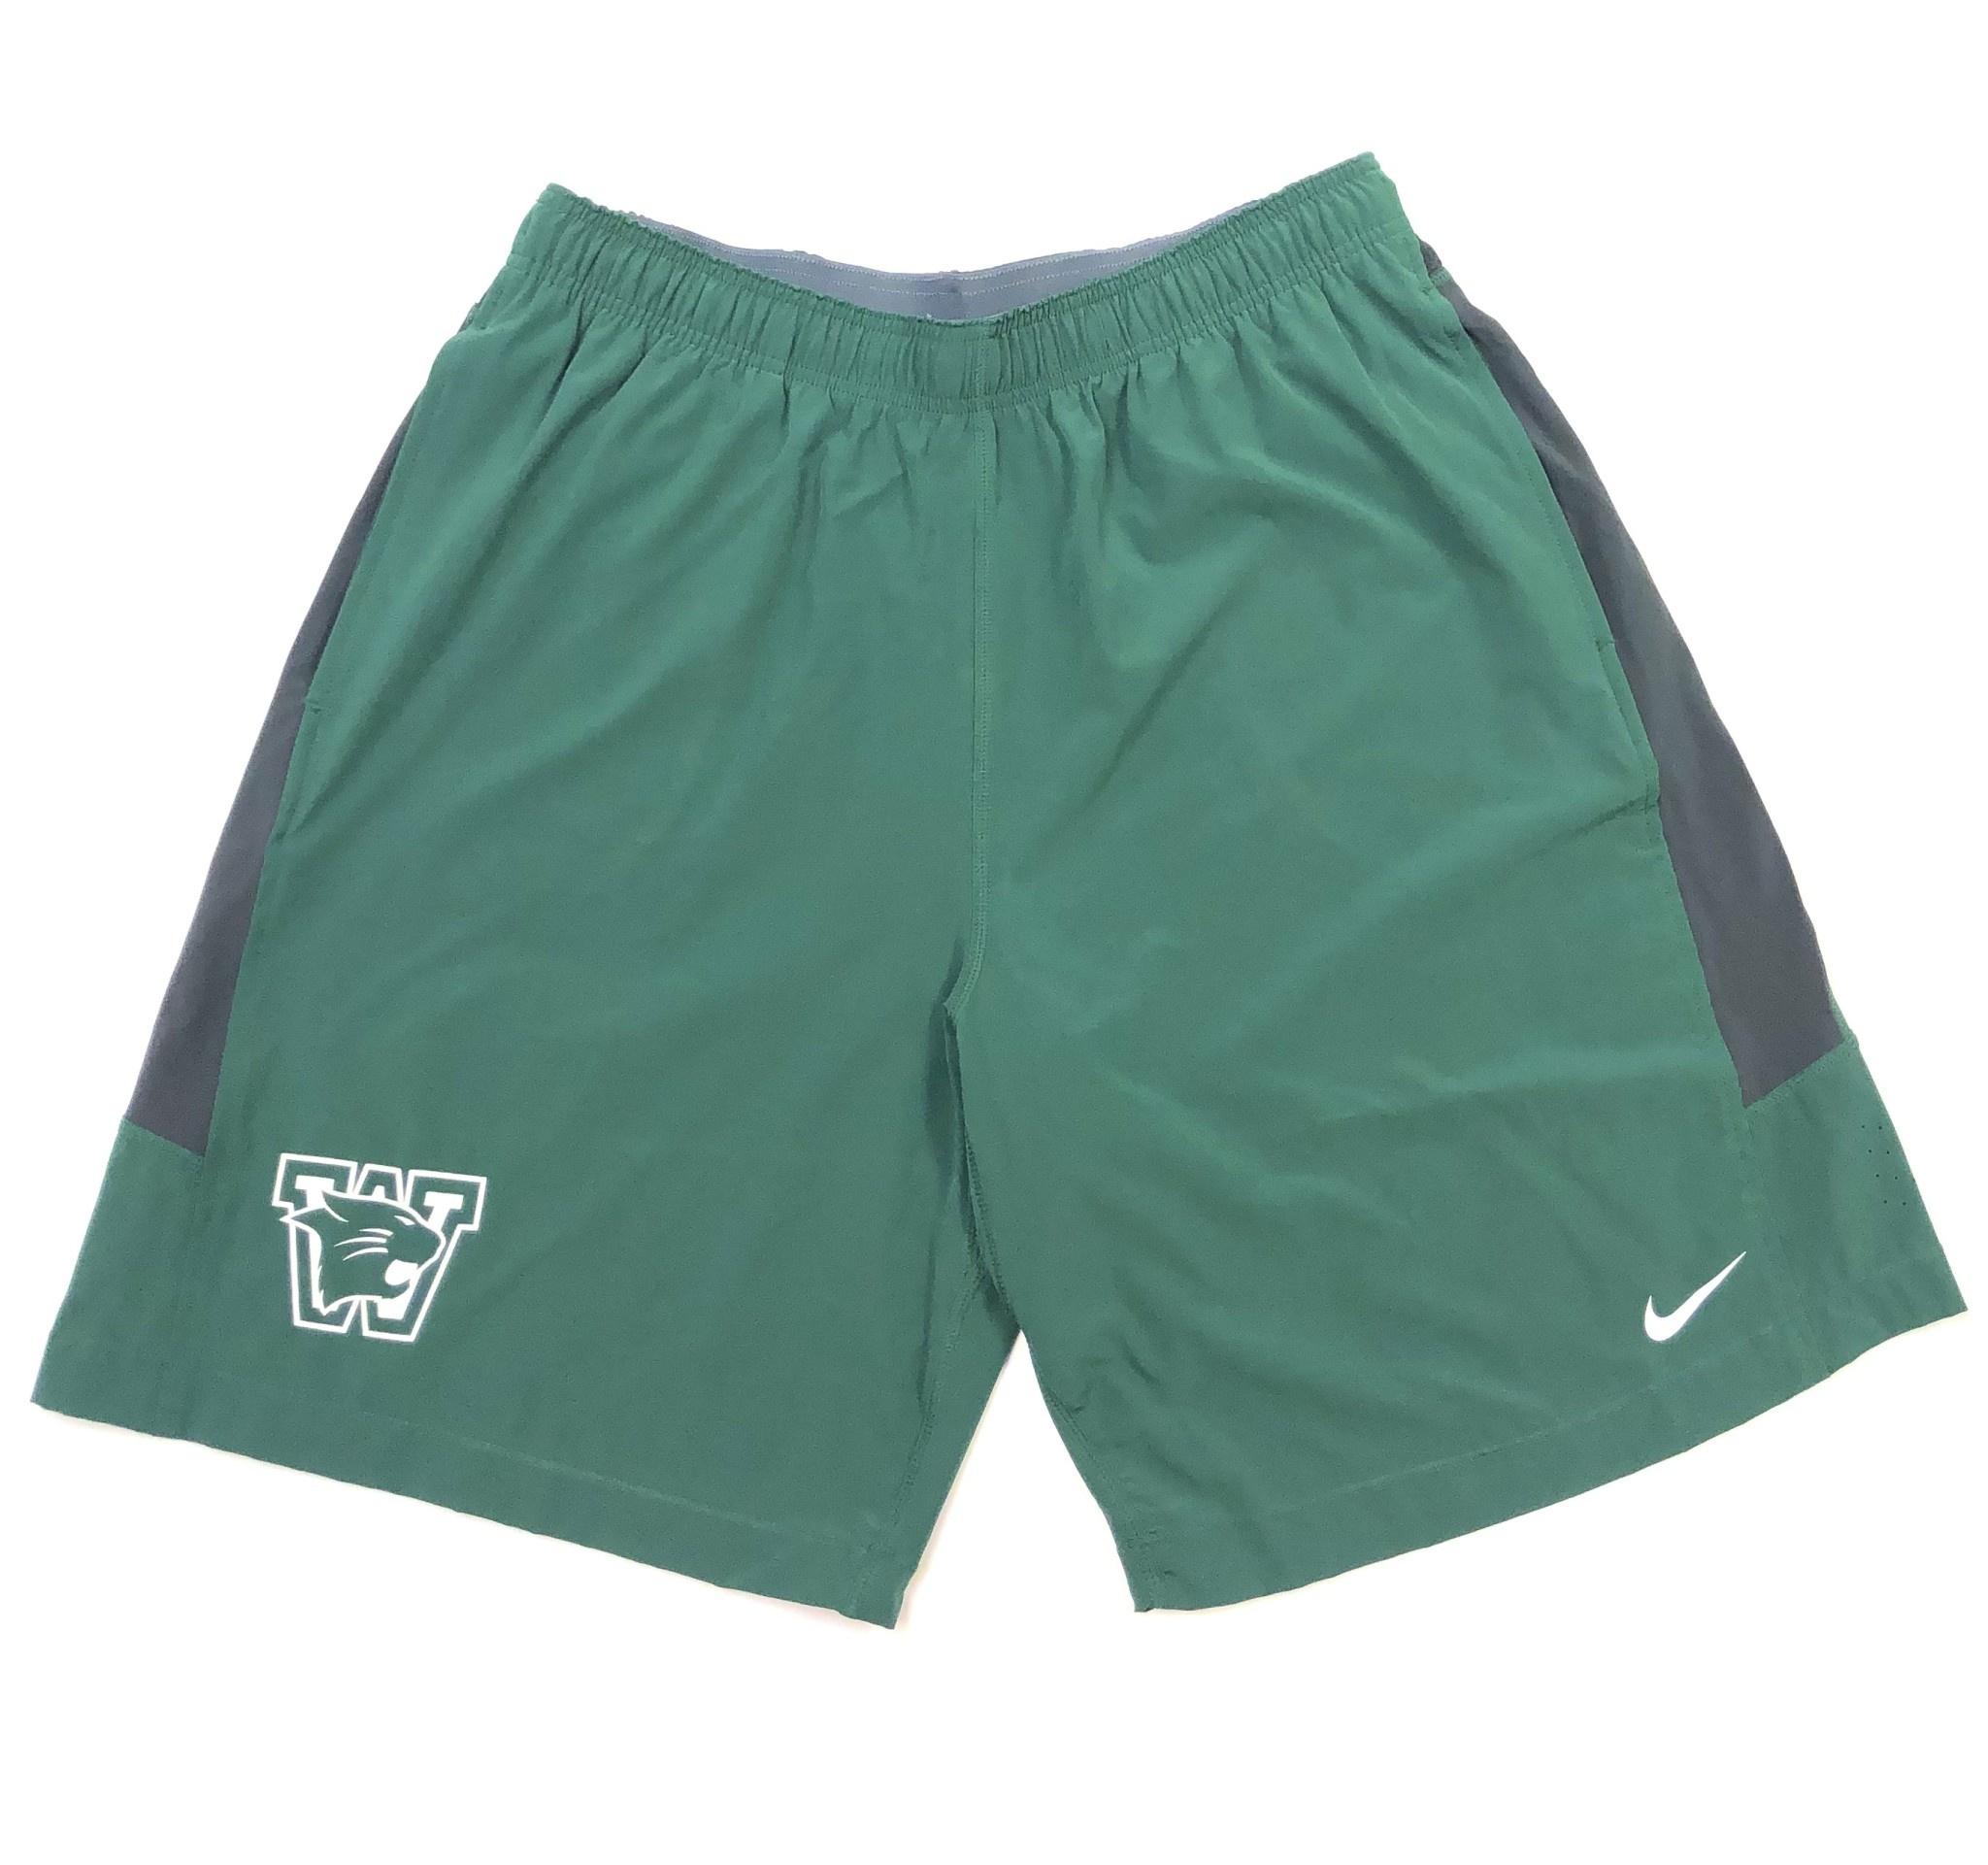 Nike Shorts: Nike XL Green Speedvent